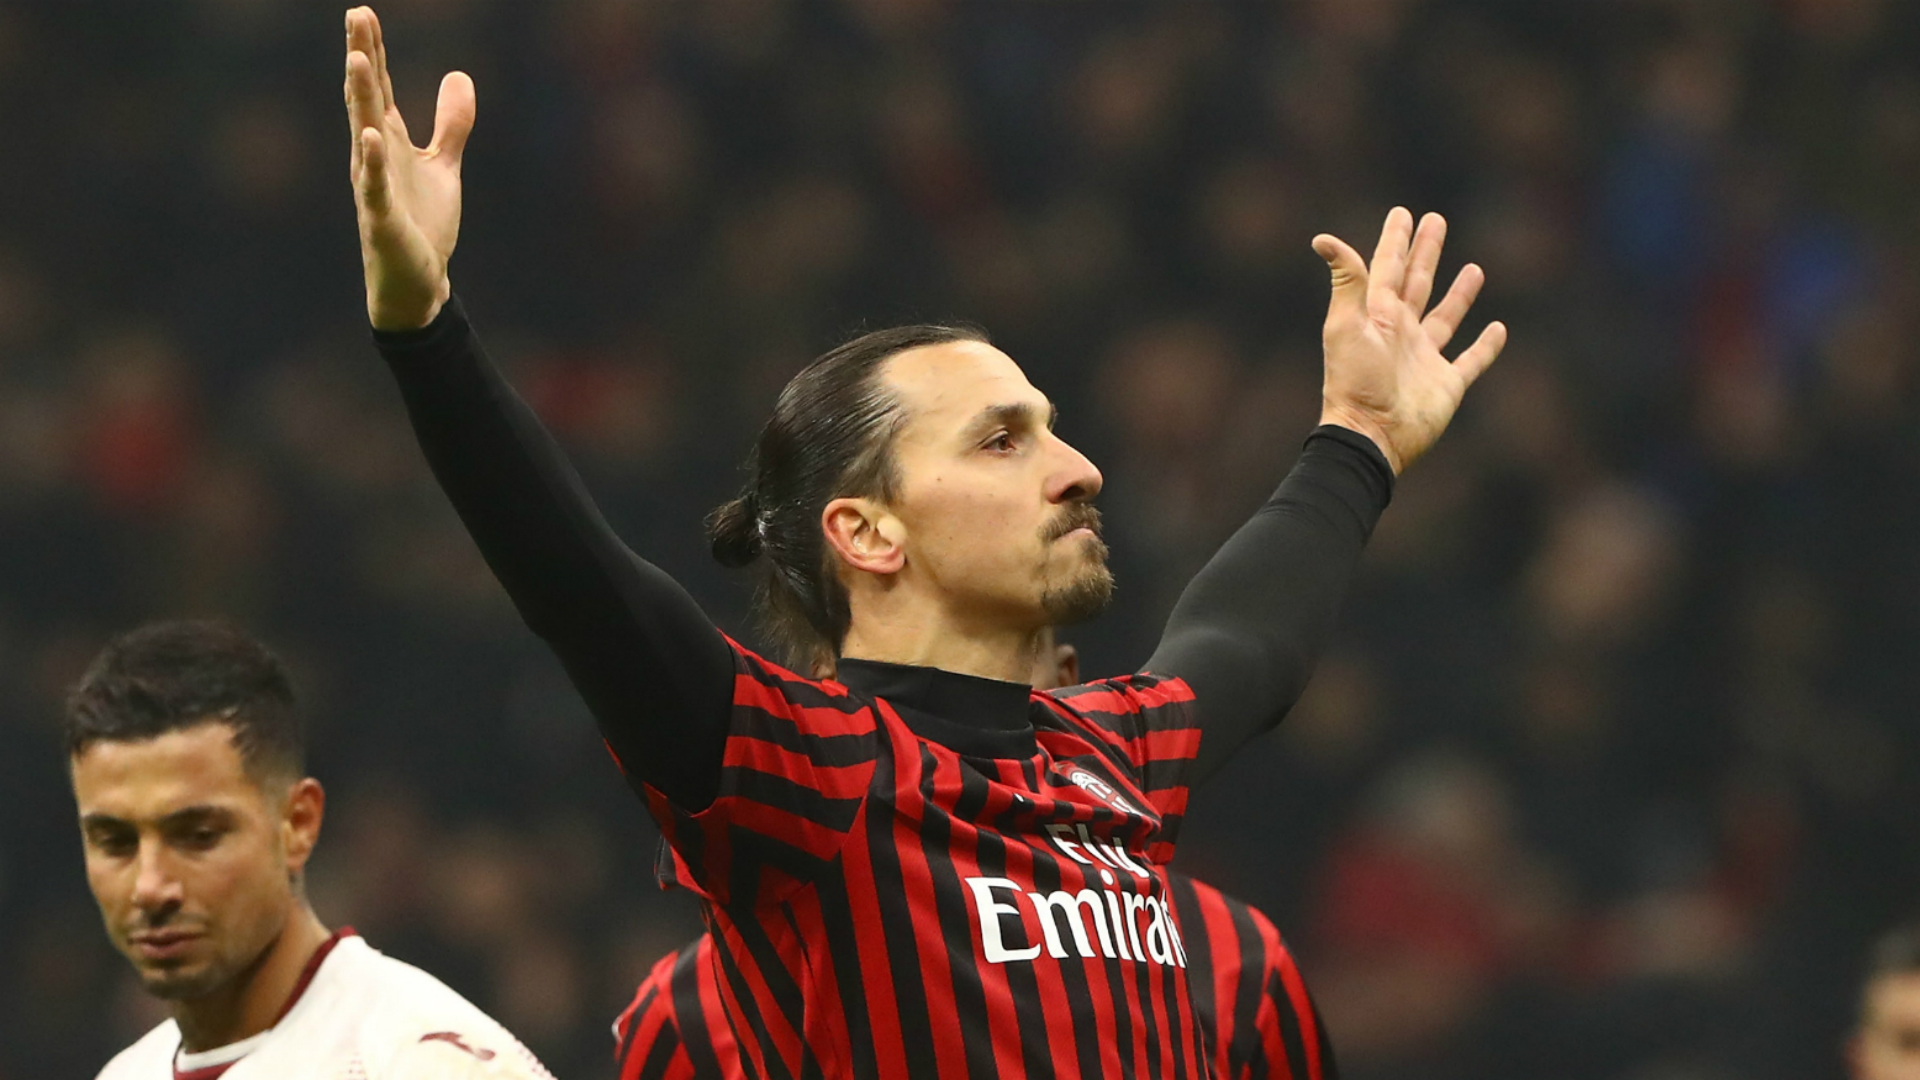 Ibrahimovic can bring glory days back to AC Milan, says Cafu